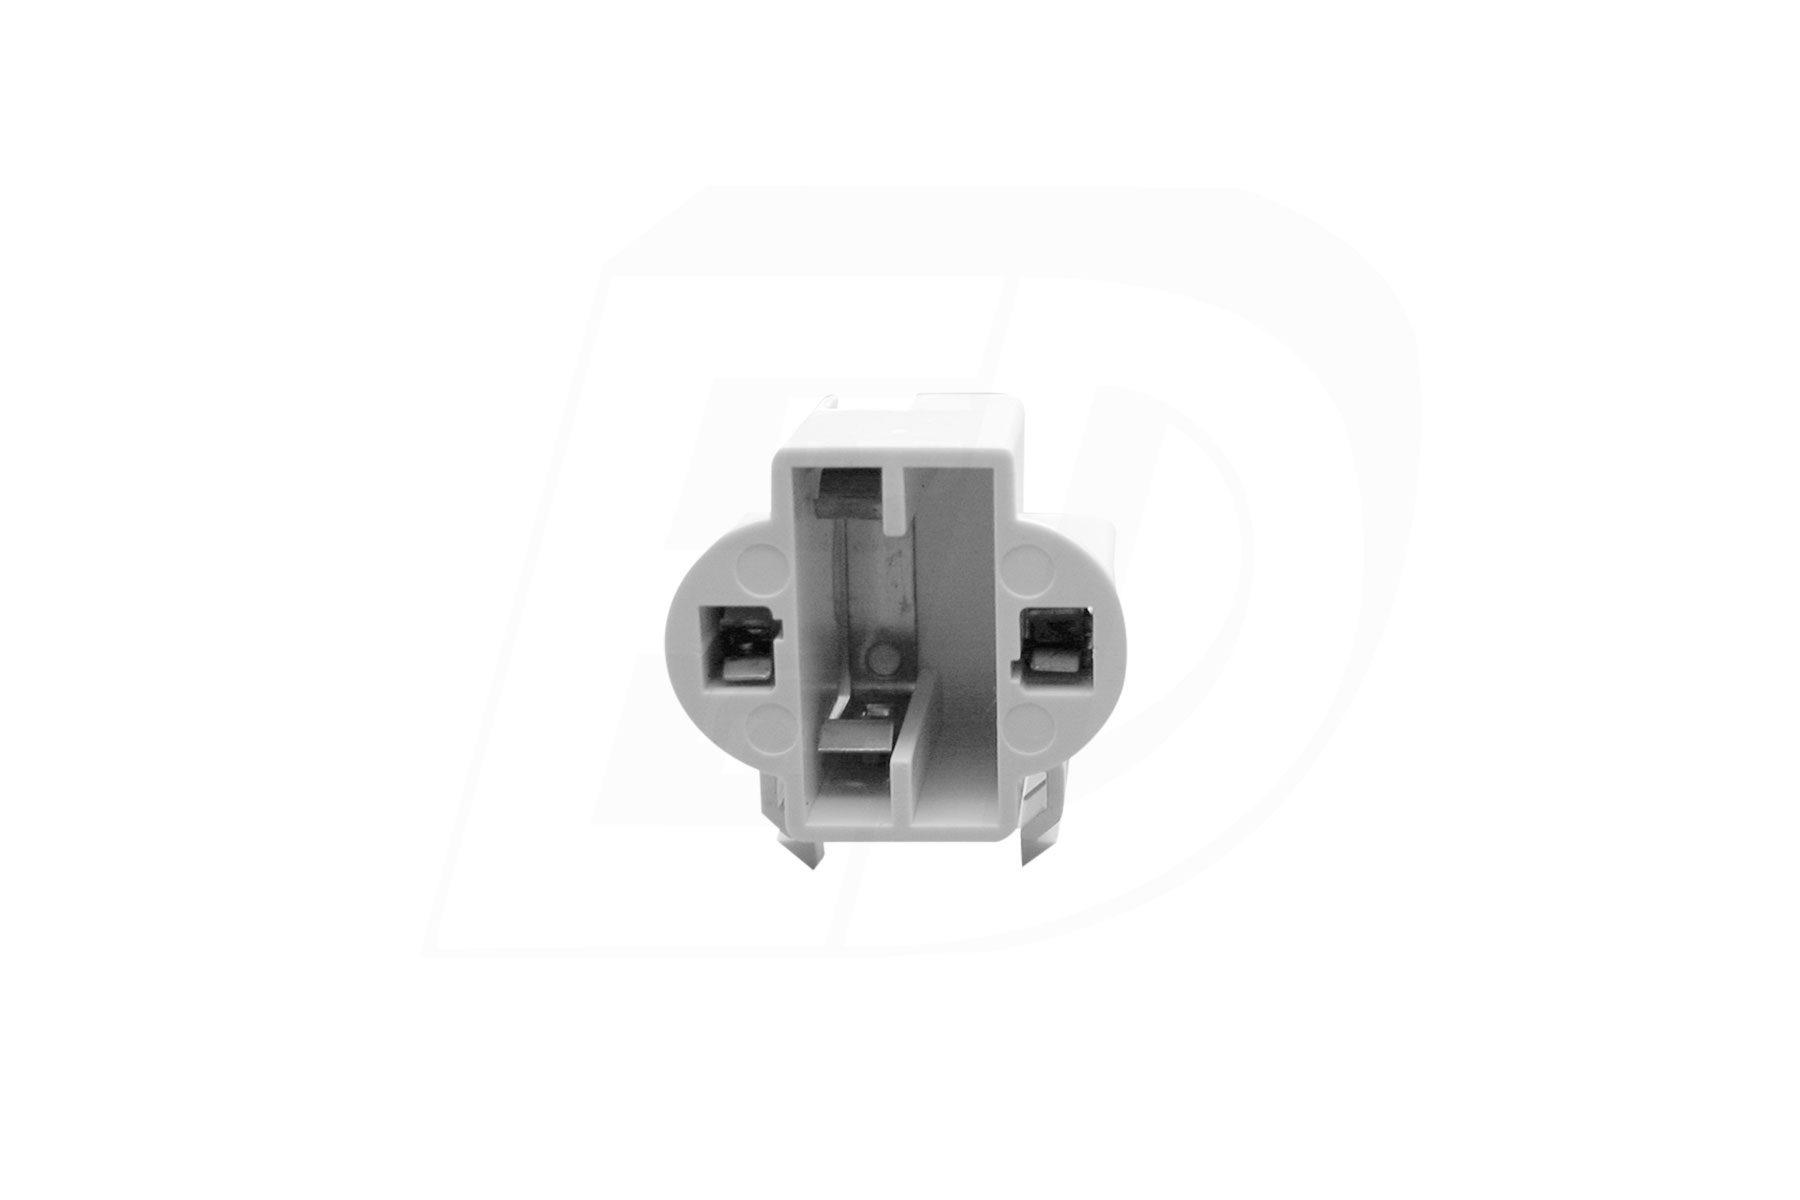 G23-2 CFL Light Socket - Horizontal Snap-in Mount